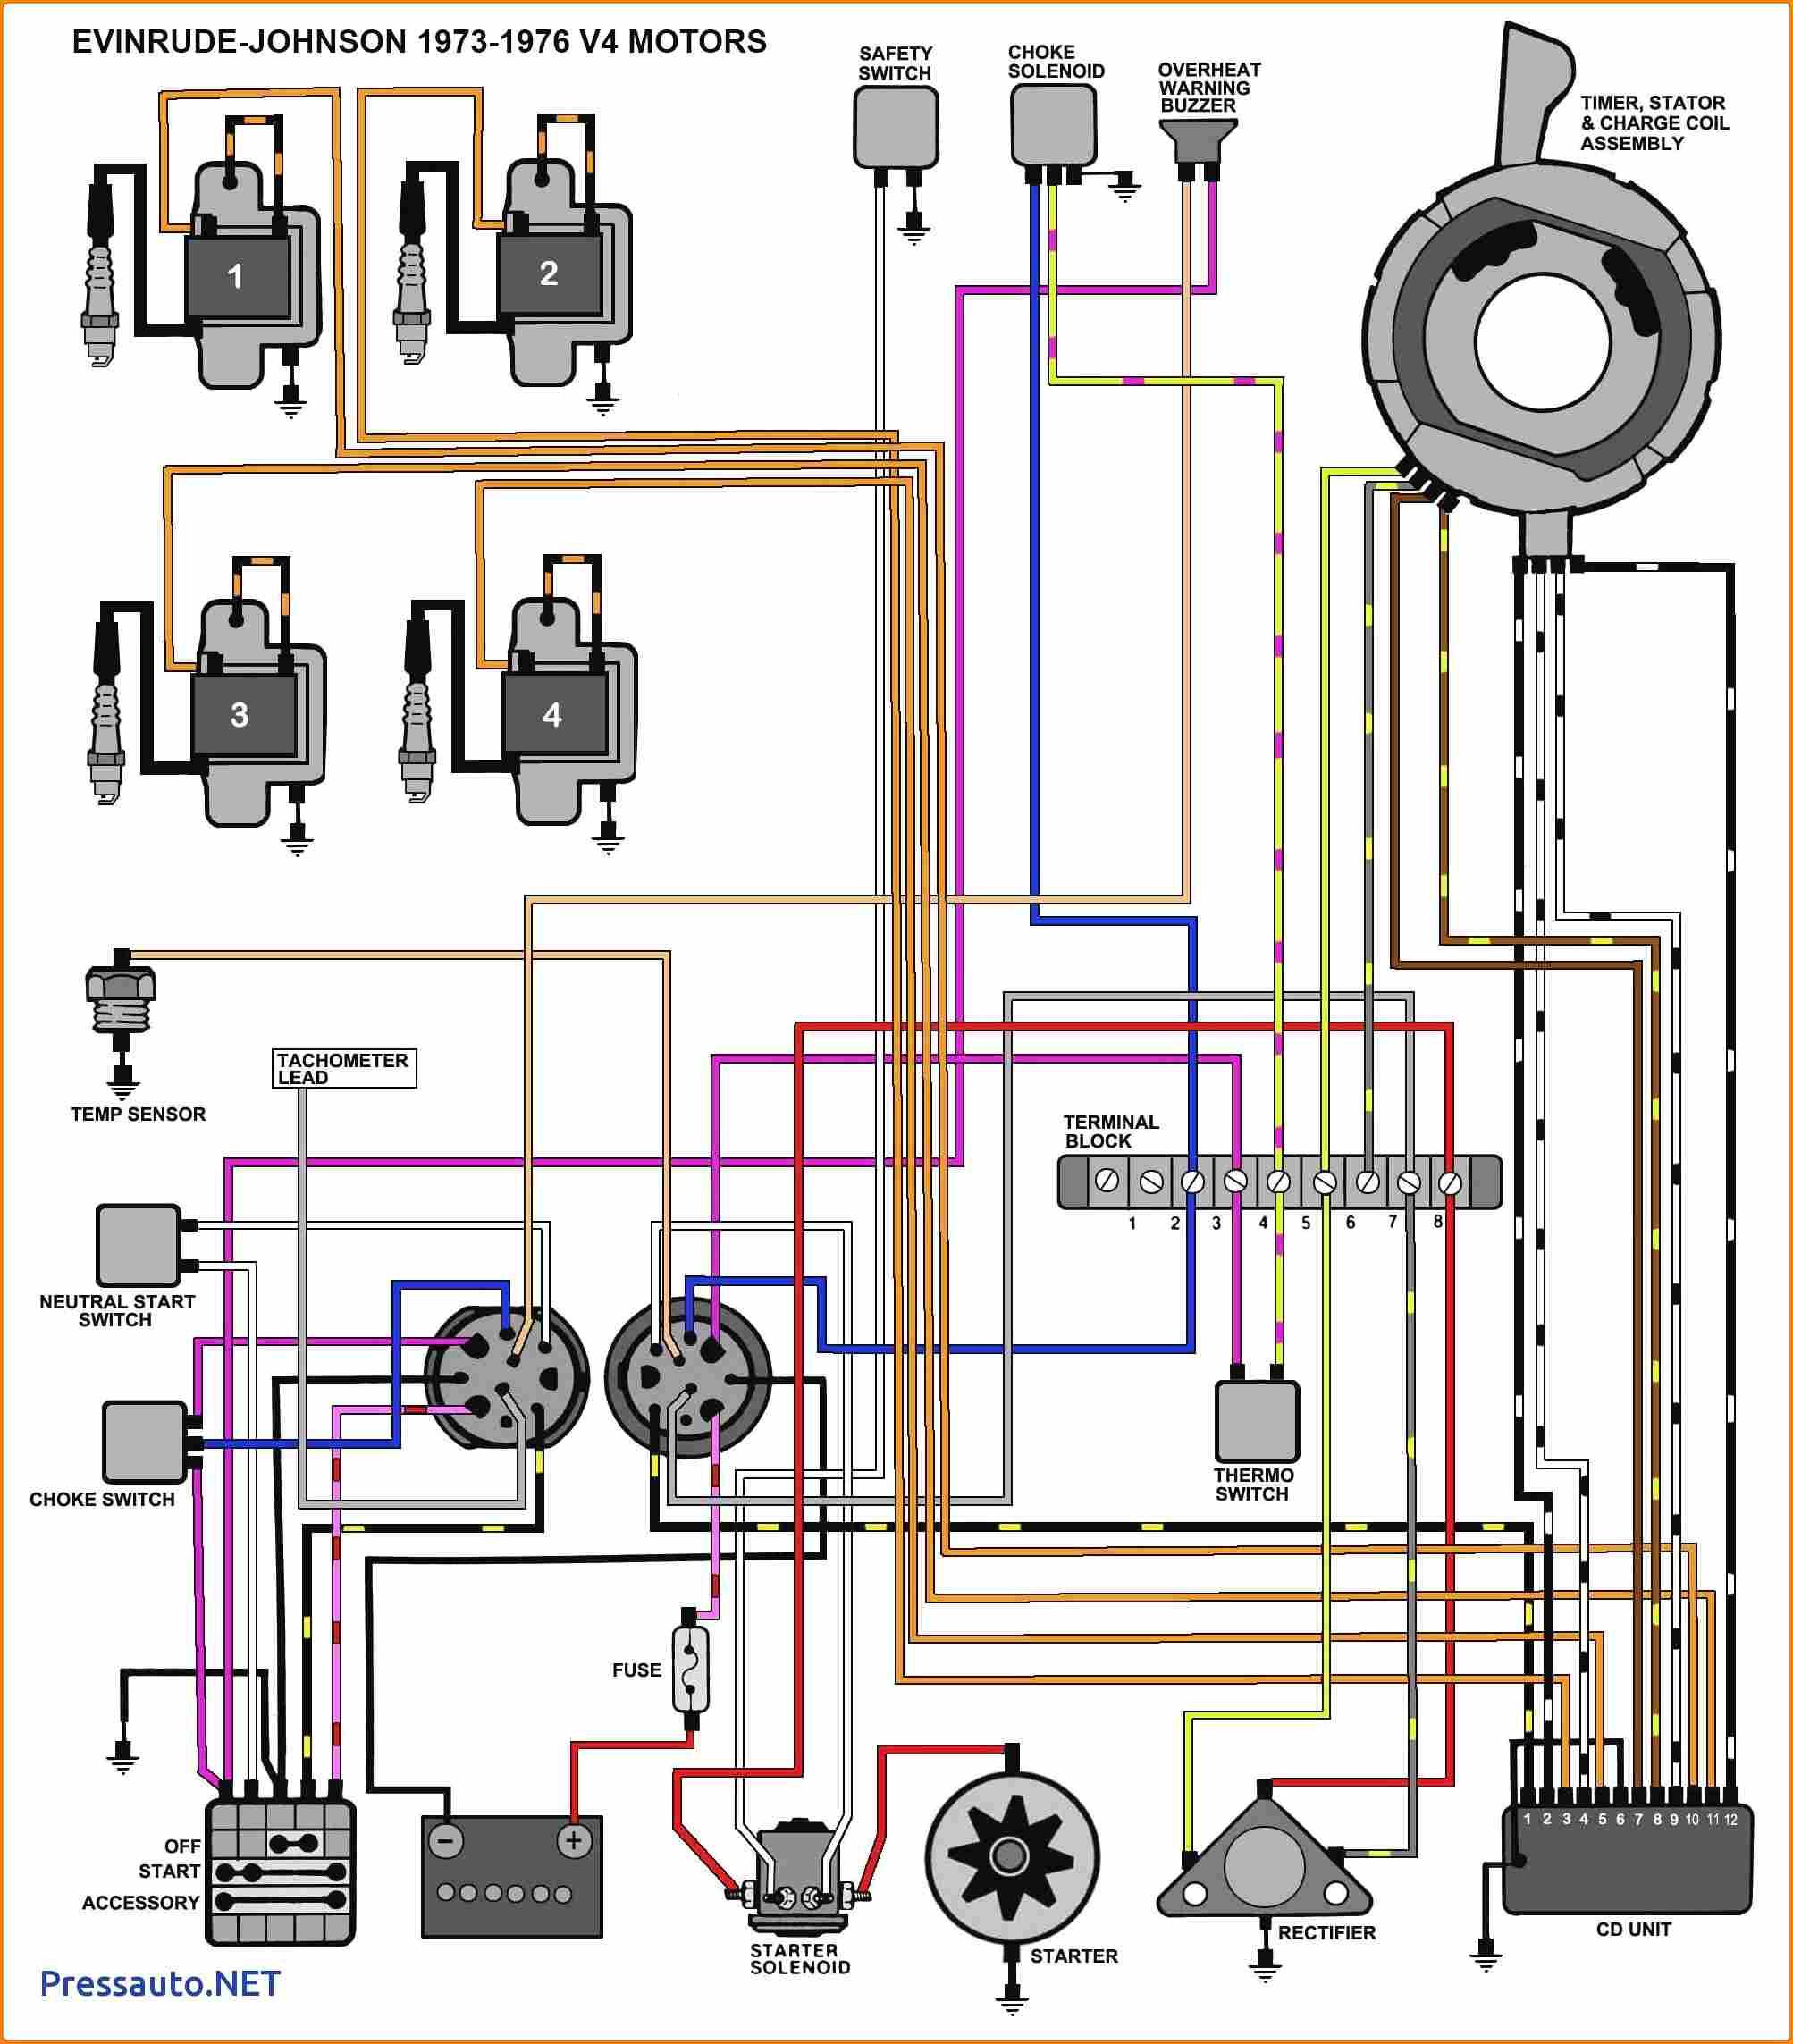 1990 Evinrude 70 Hp Wiring Diagram